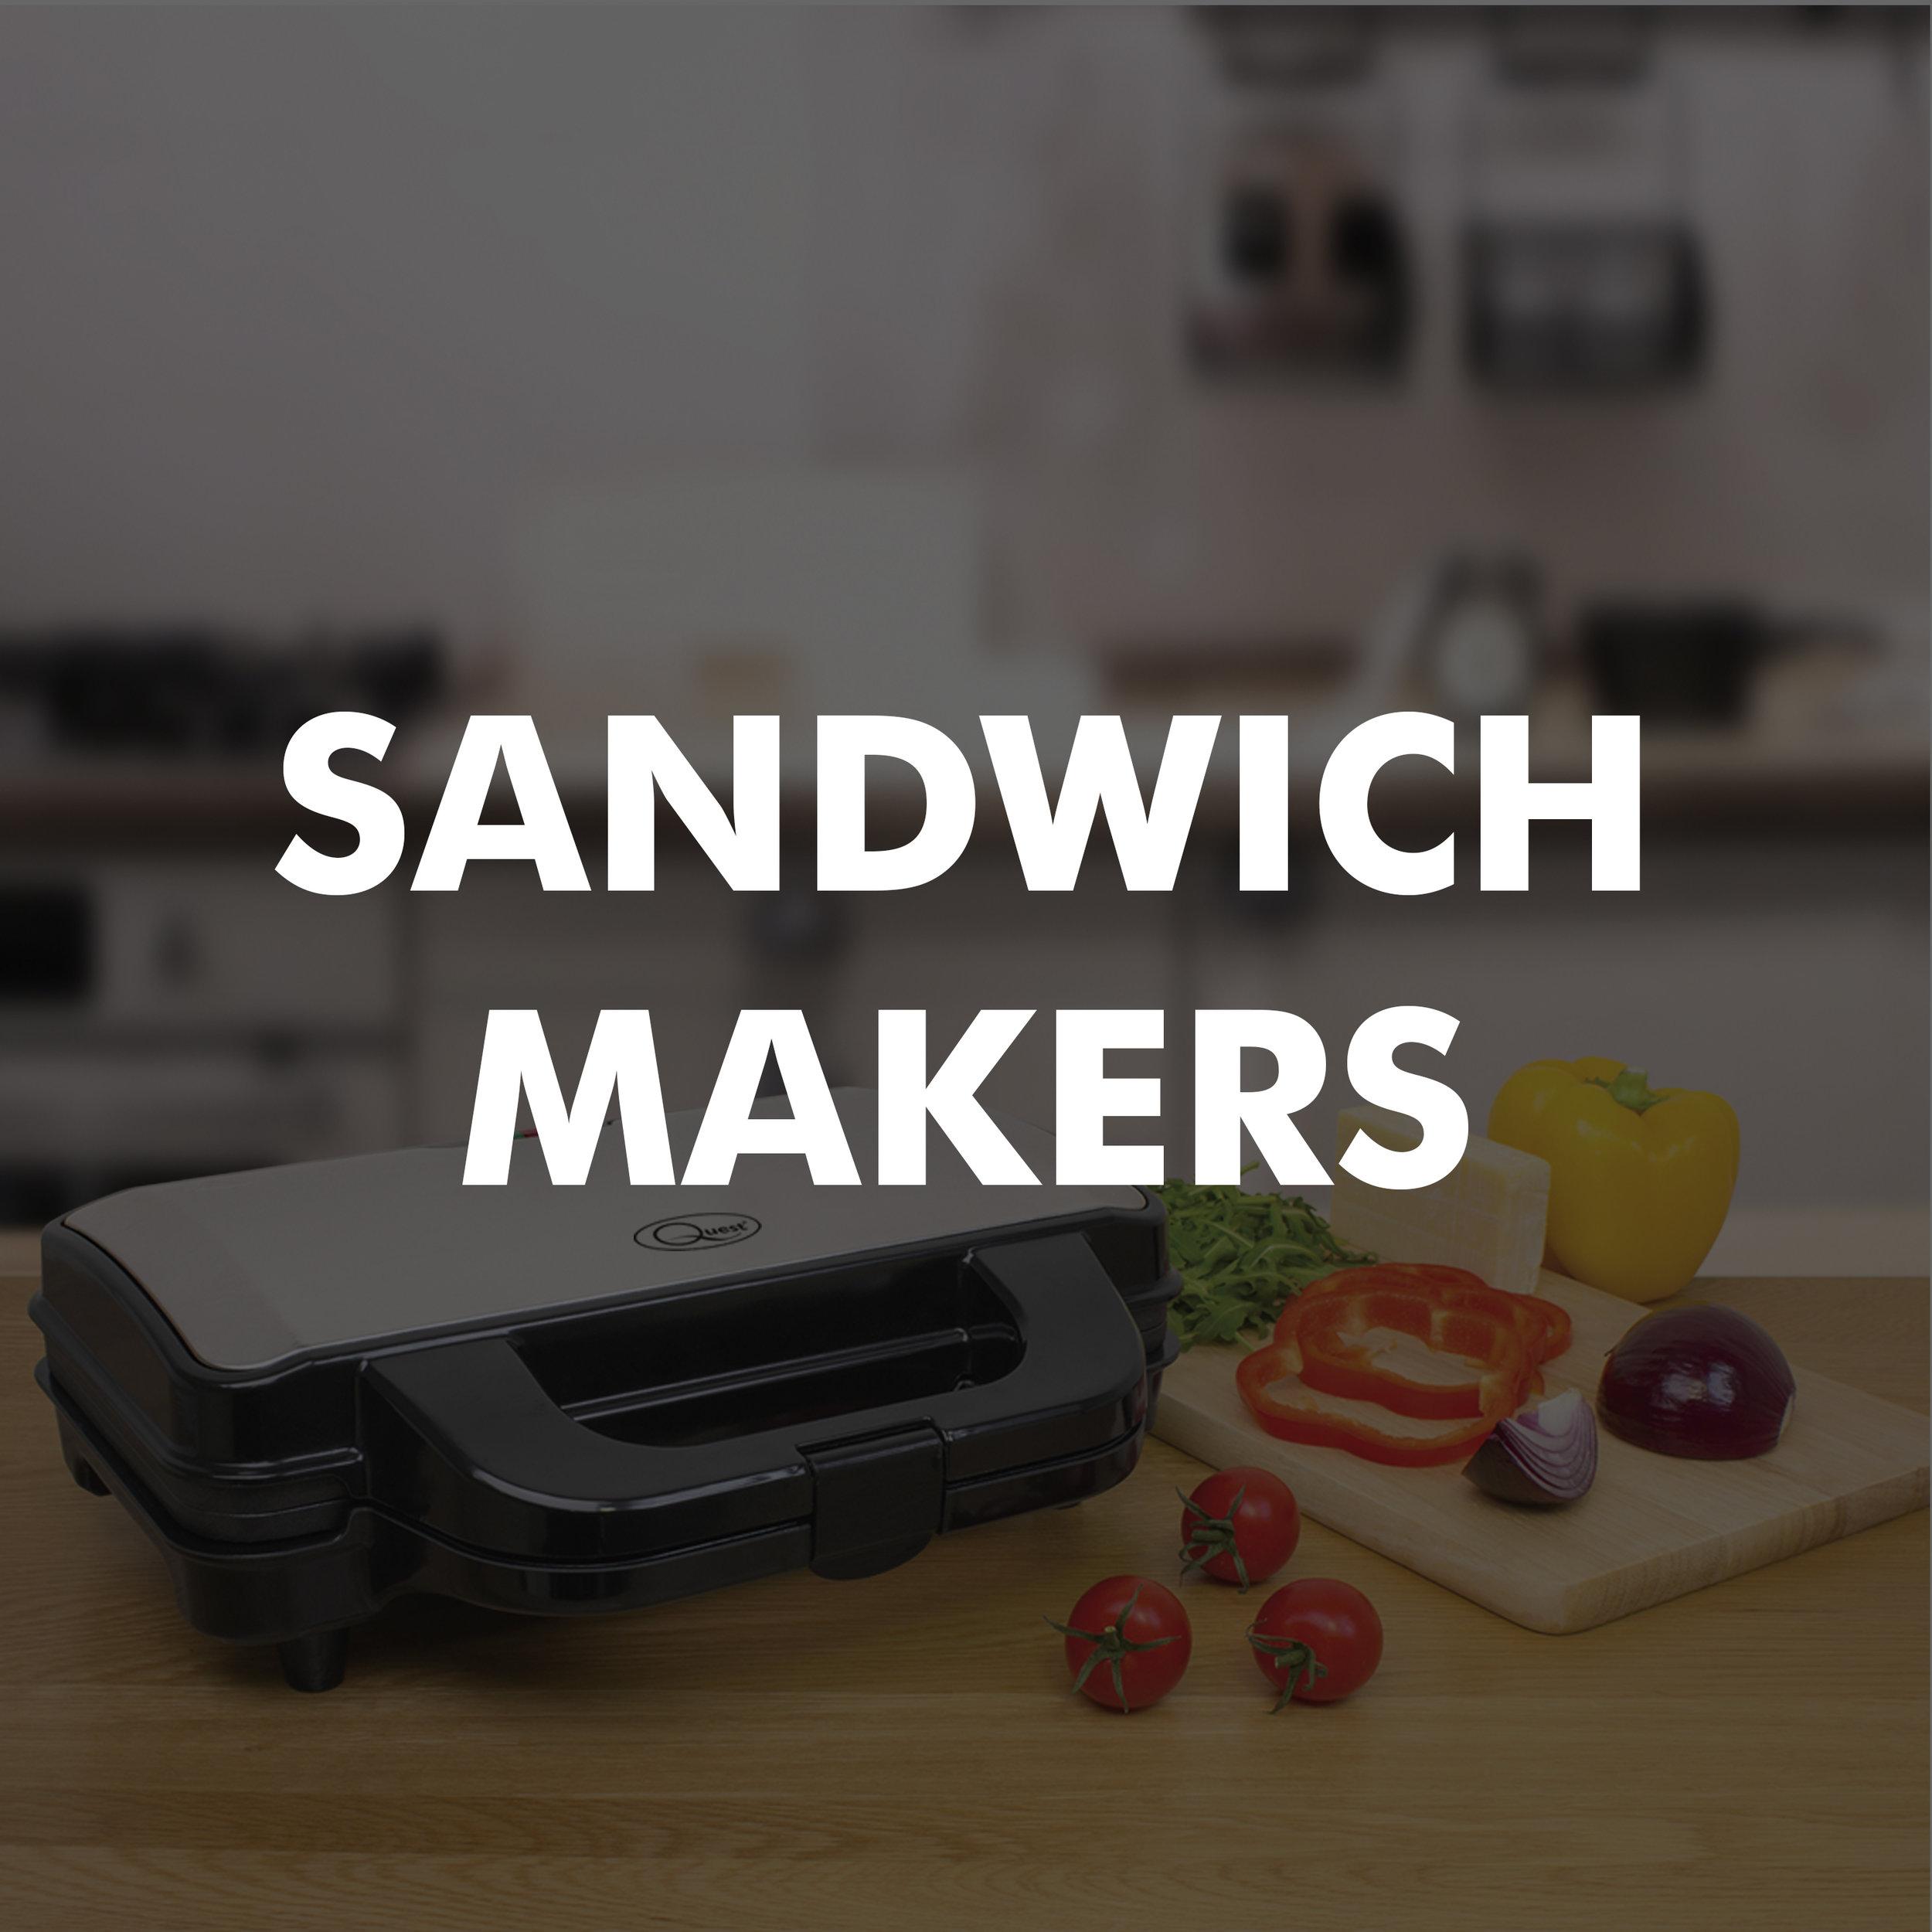 Sandwich makers category